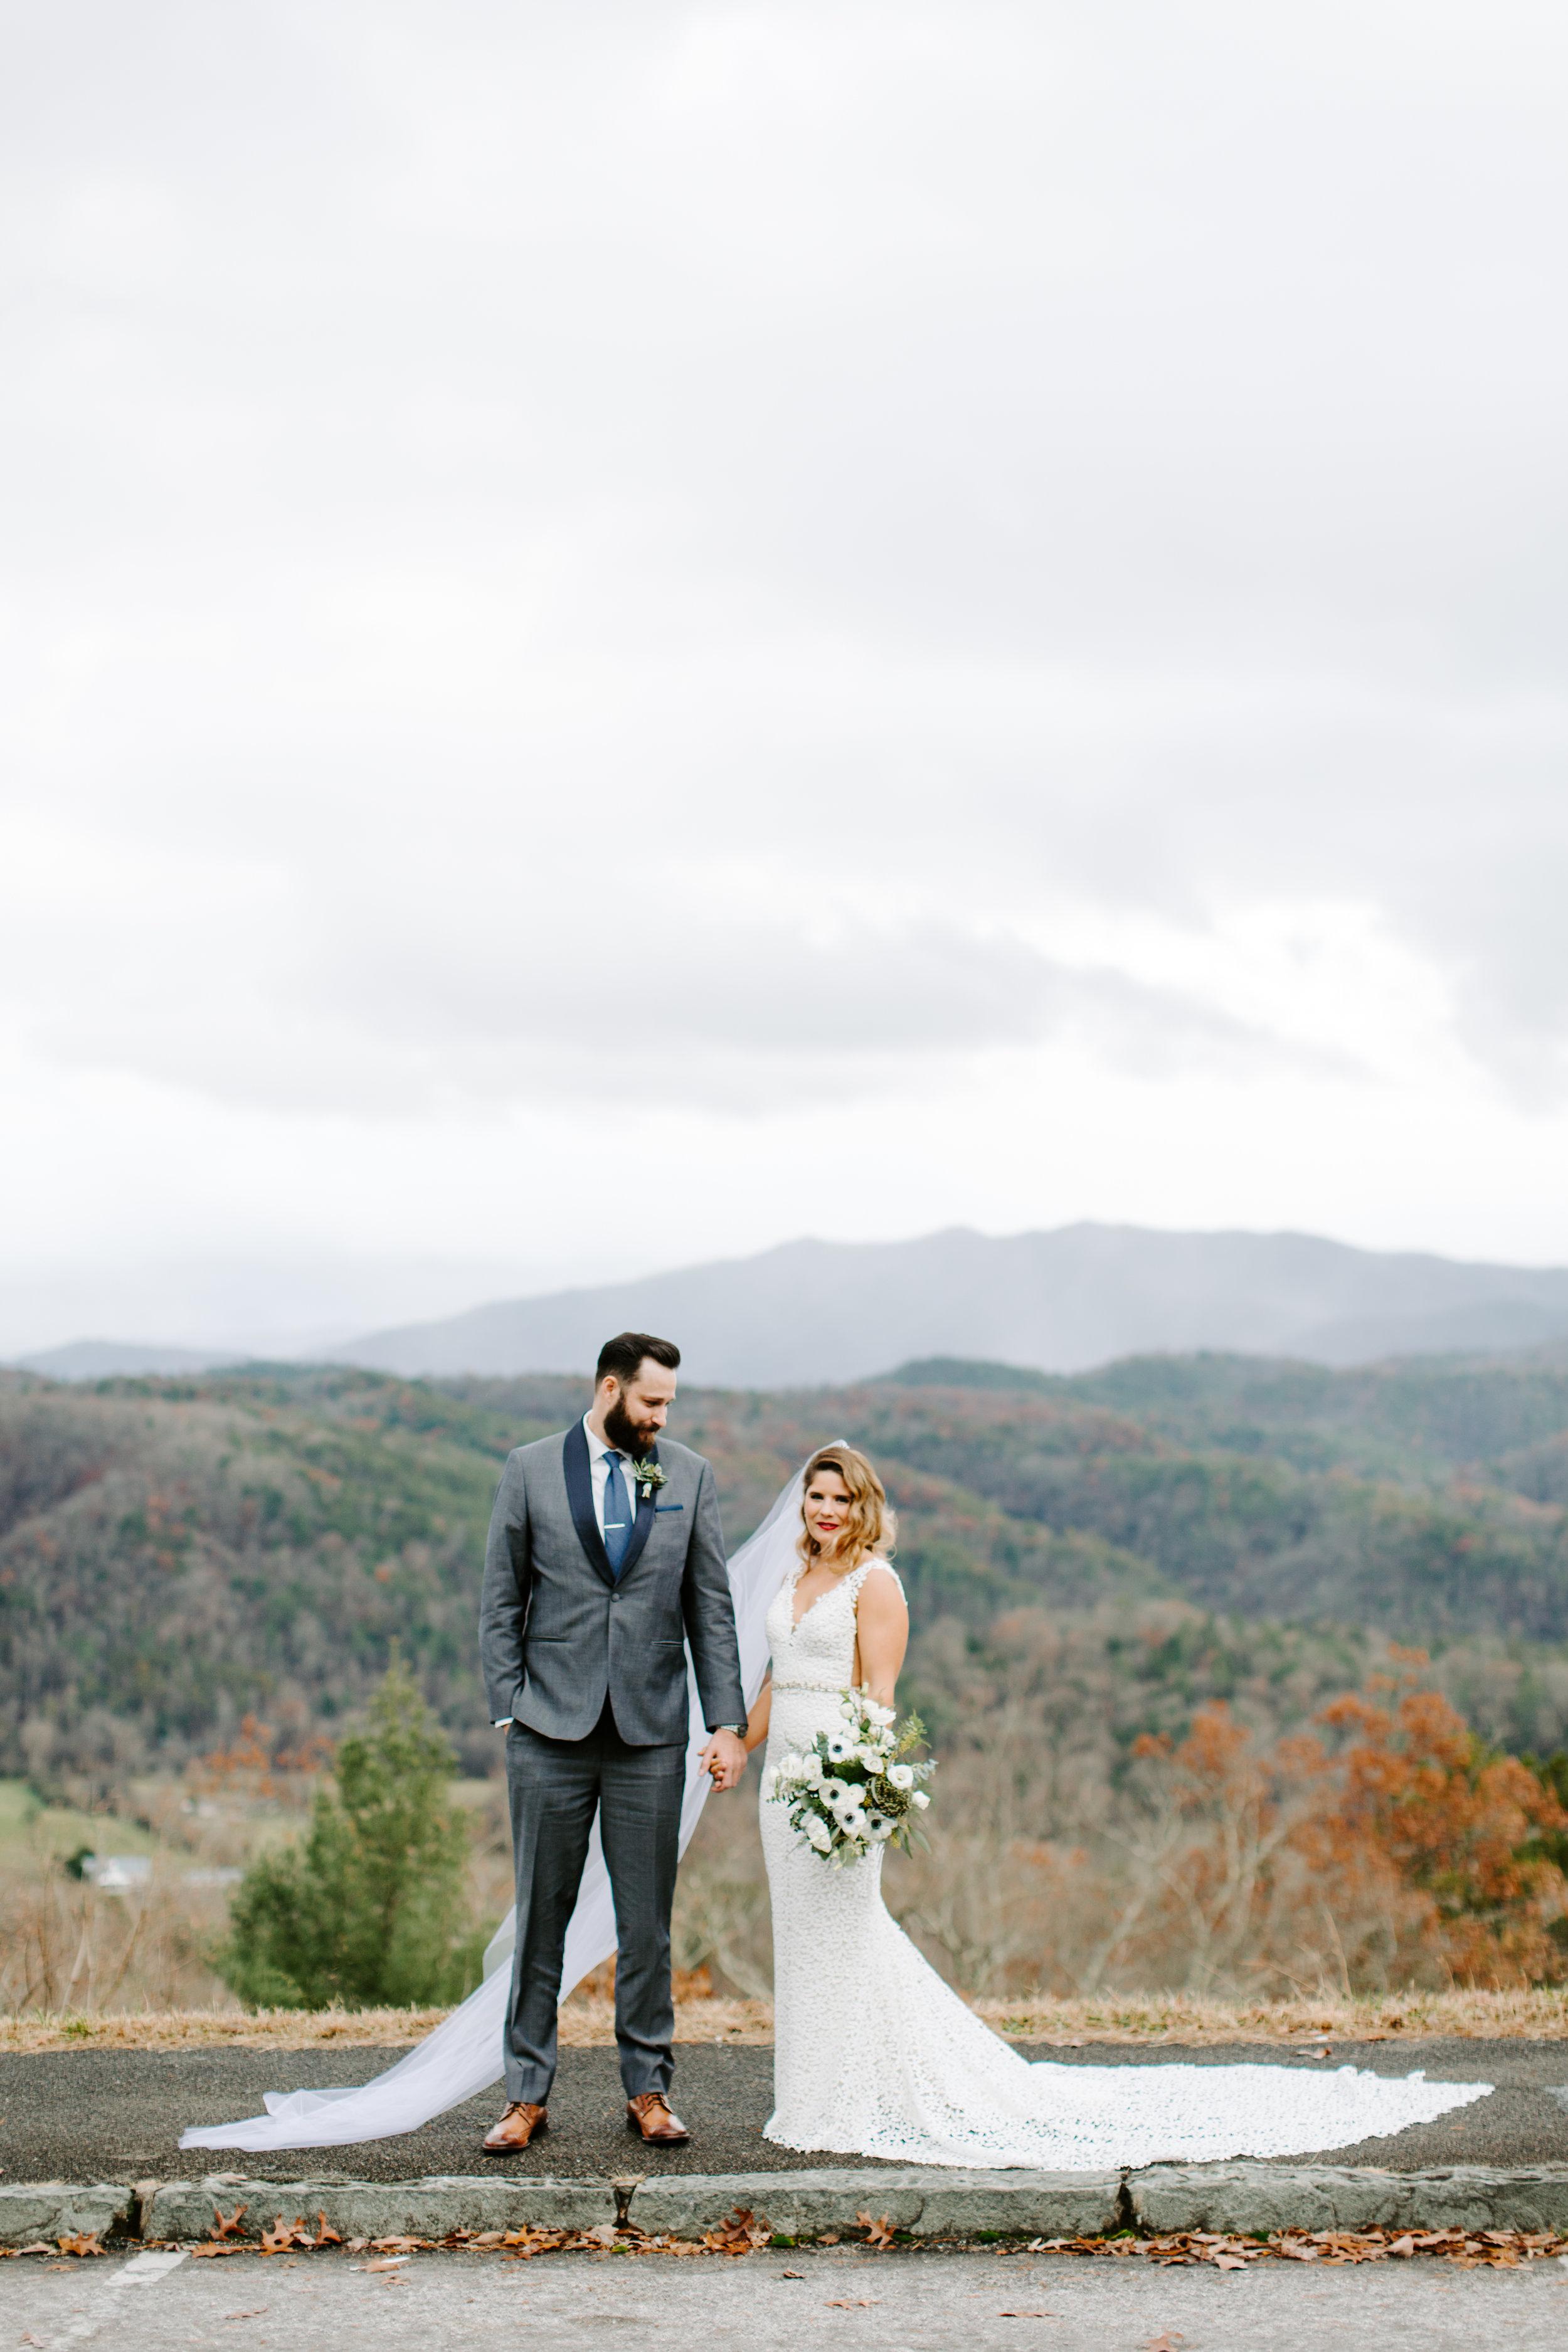 knoxville-wedding-photographer-191.JPG